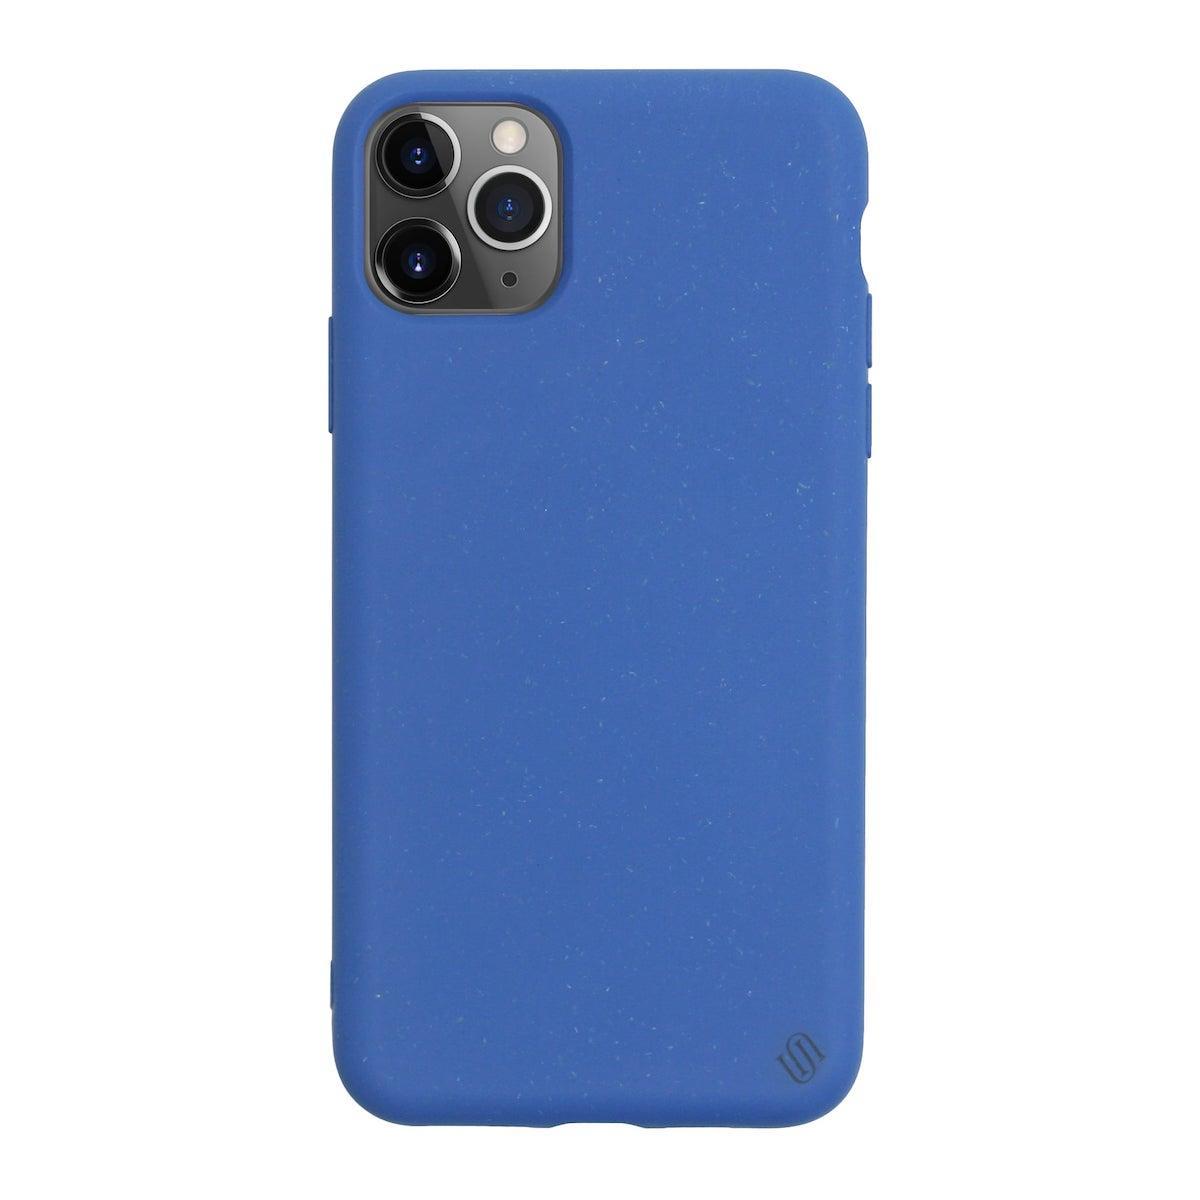 Eco Friendly Iphone 11 Pro Max Case - Plastic Free Phone Cases UK